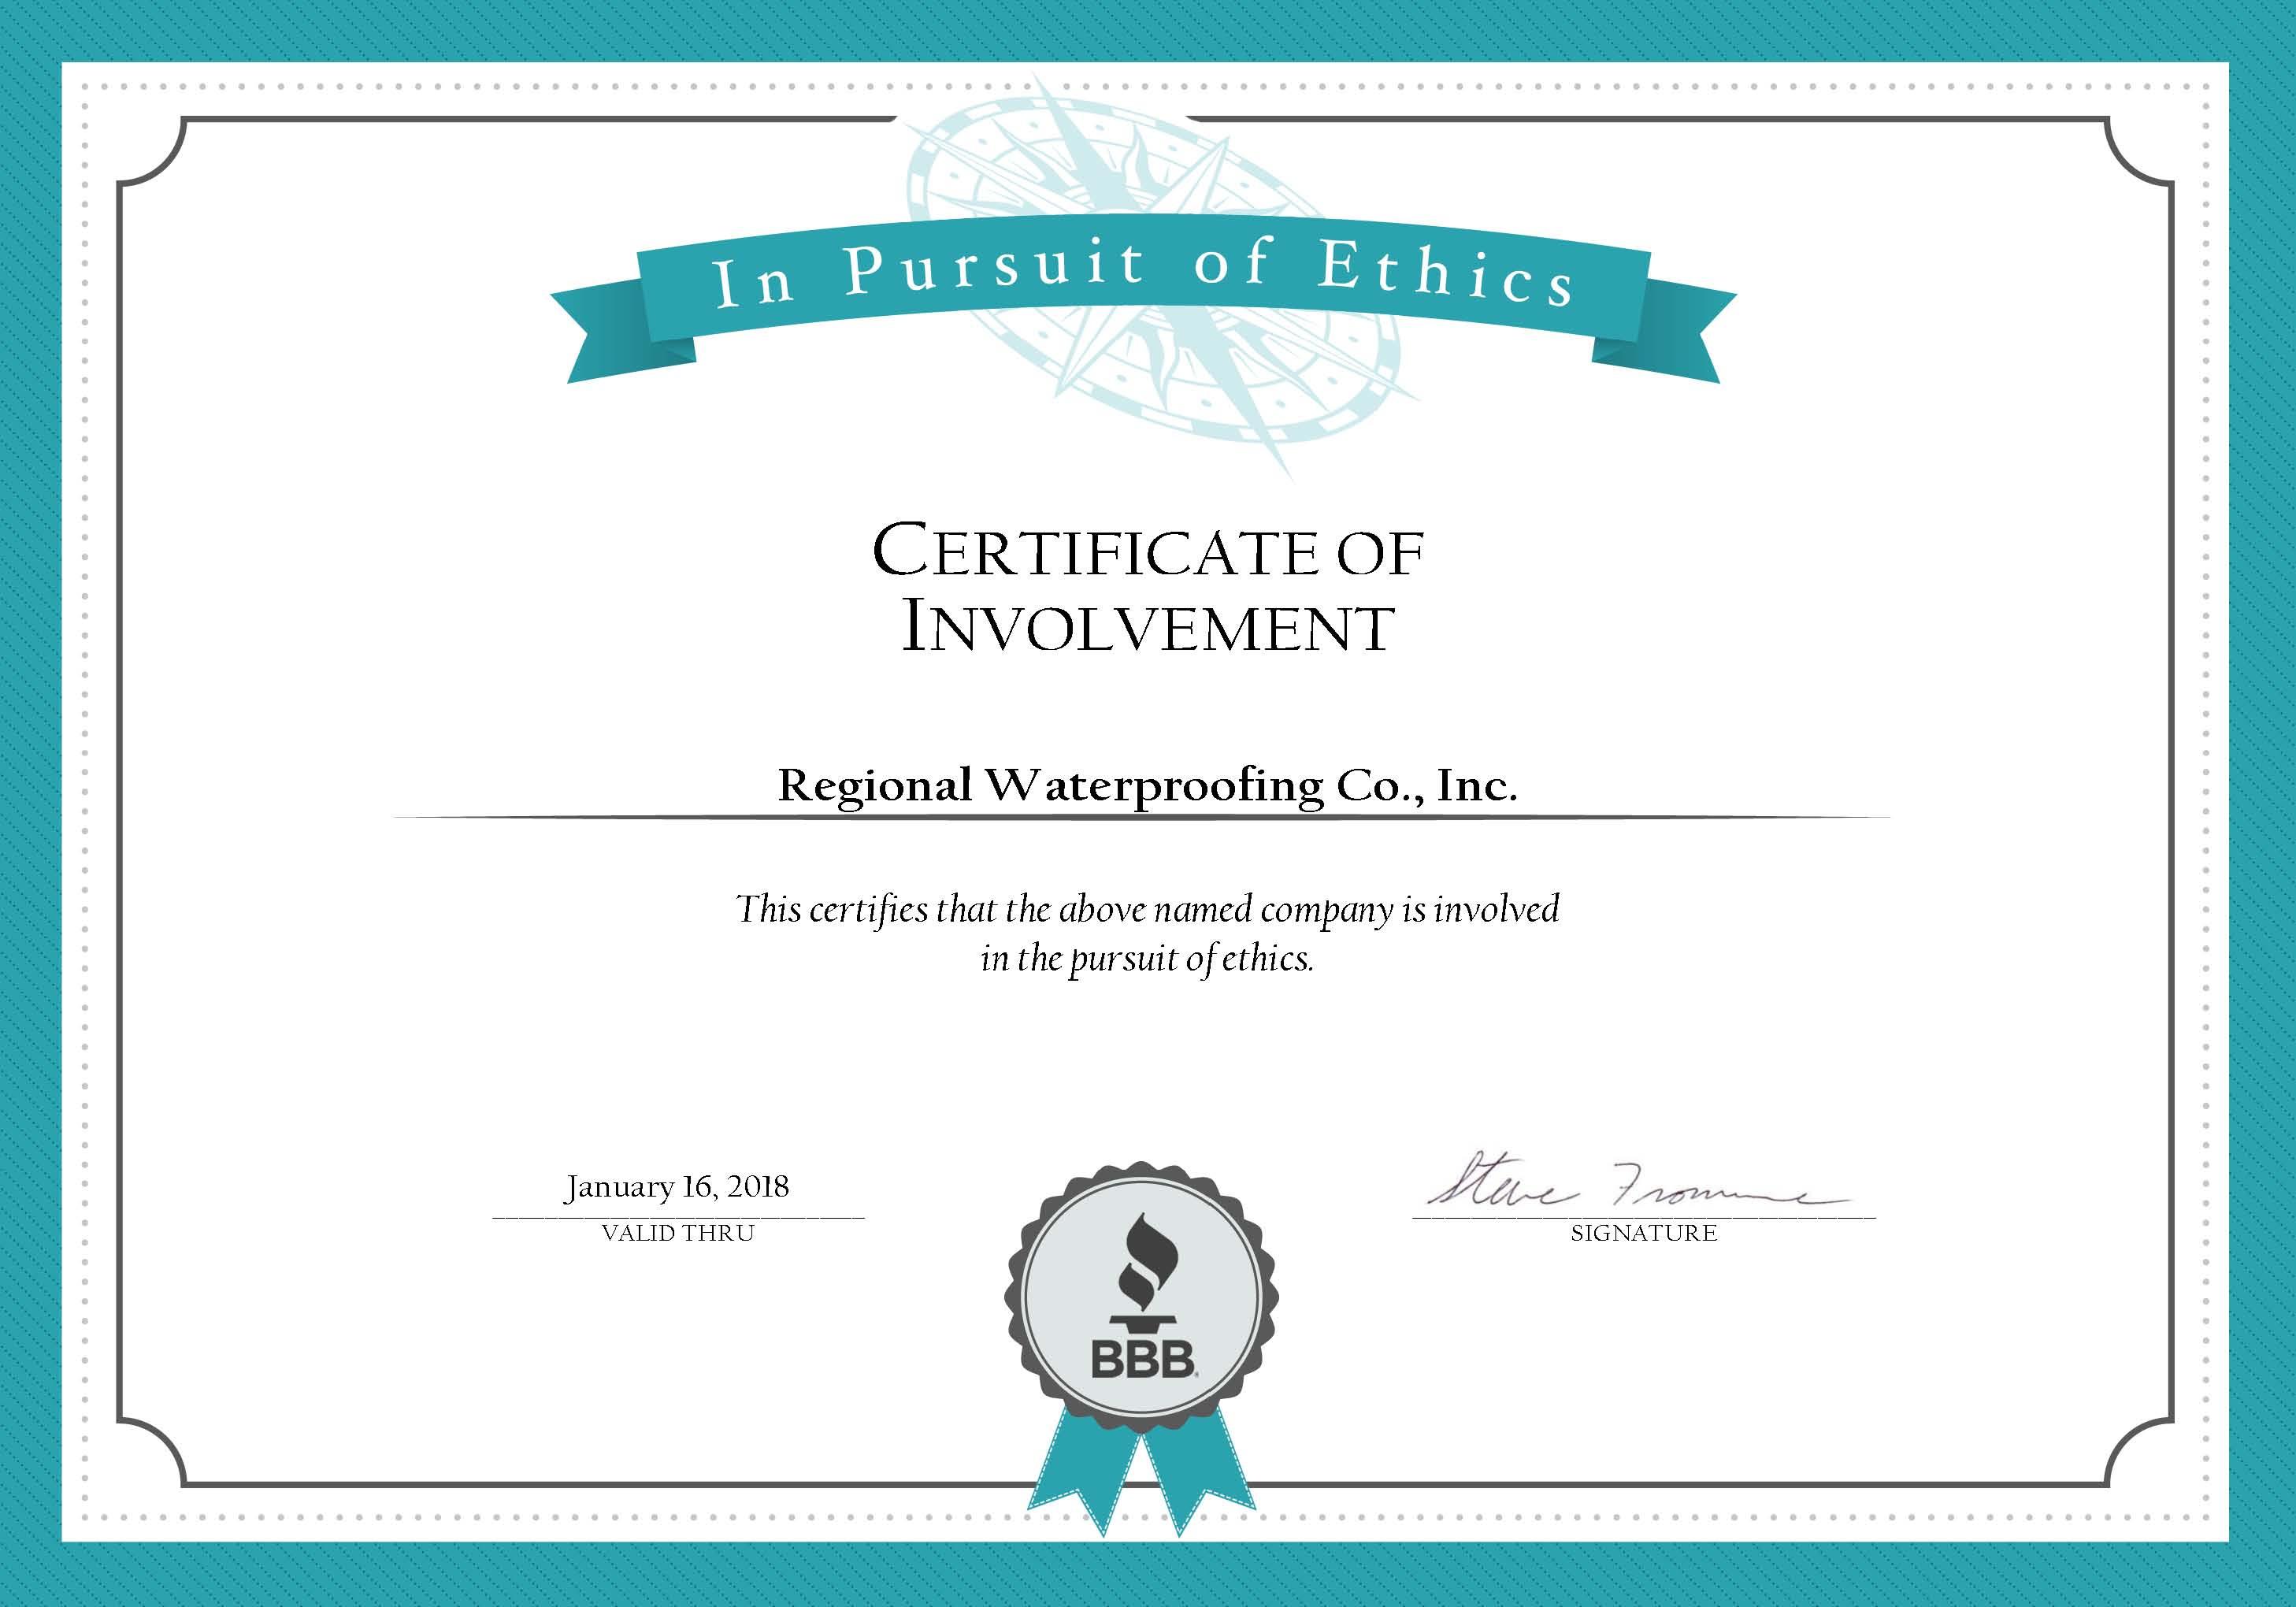 BBB Pursuit of Ethics